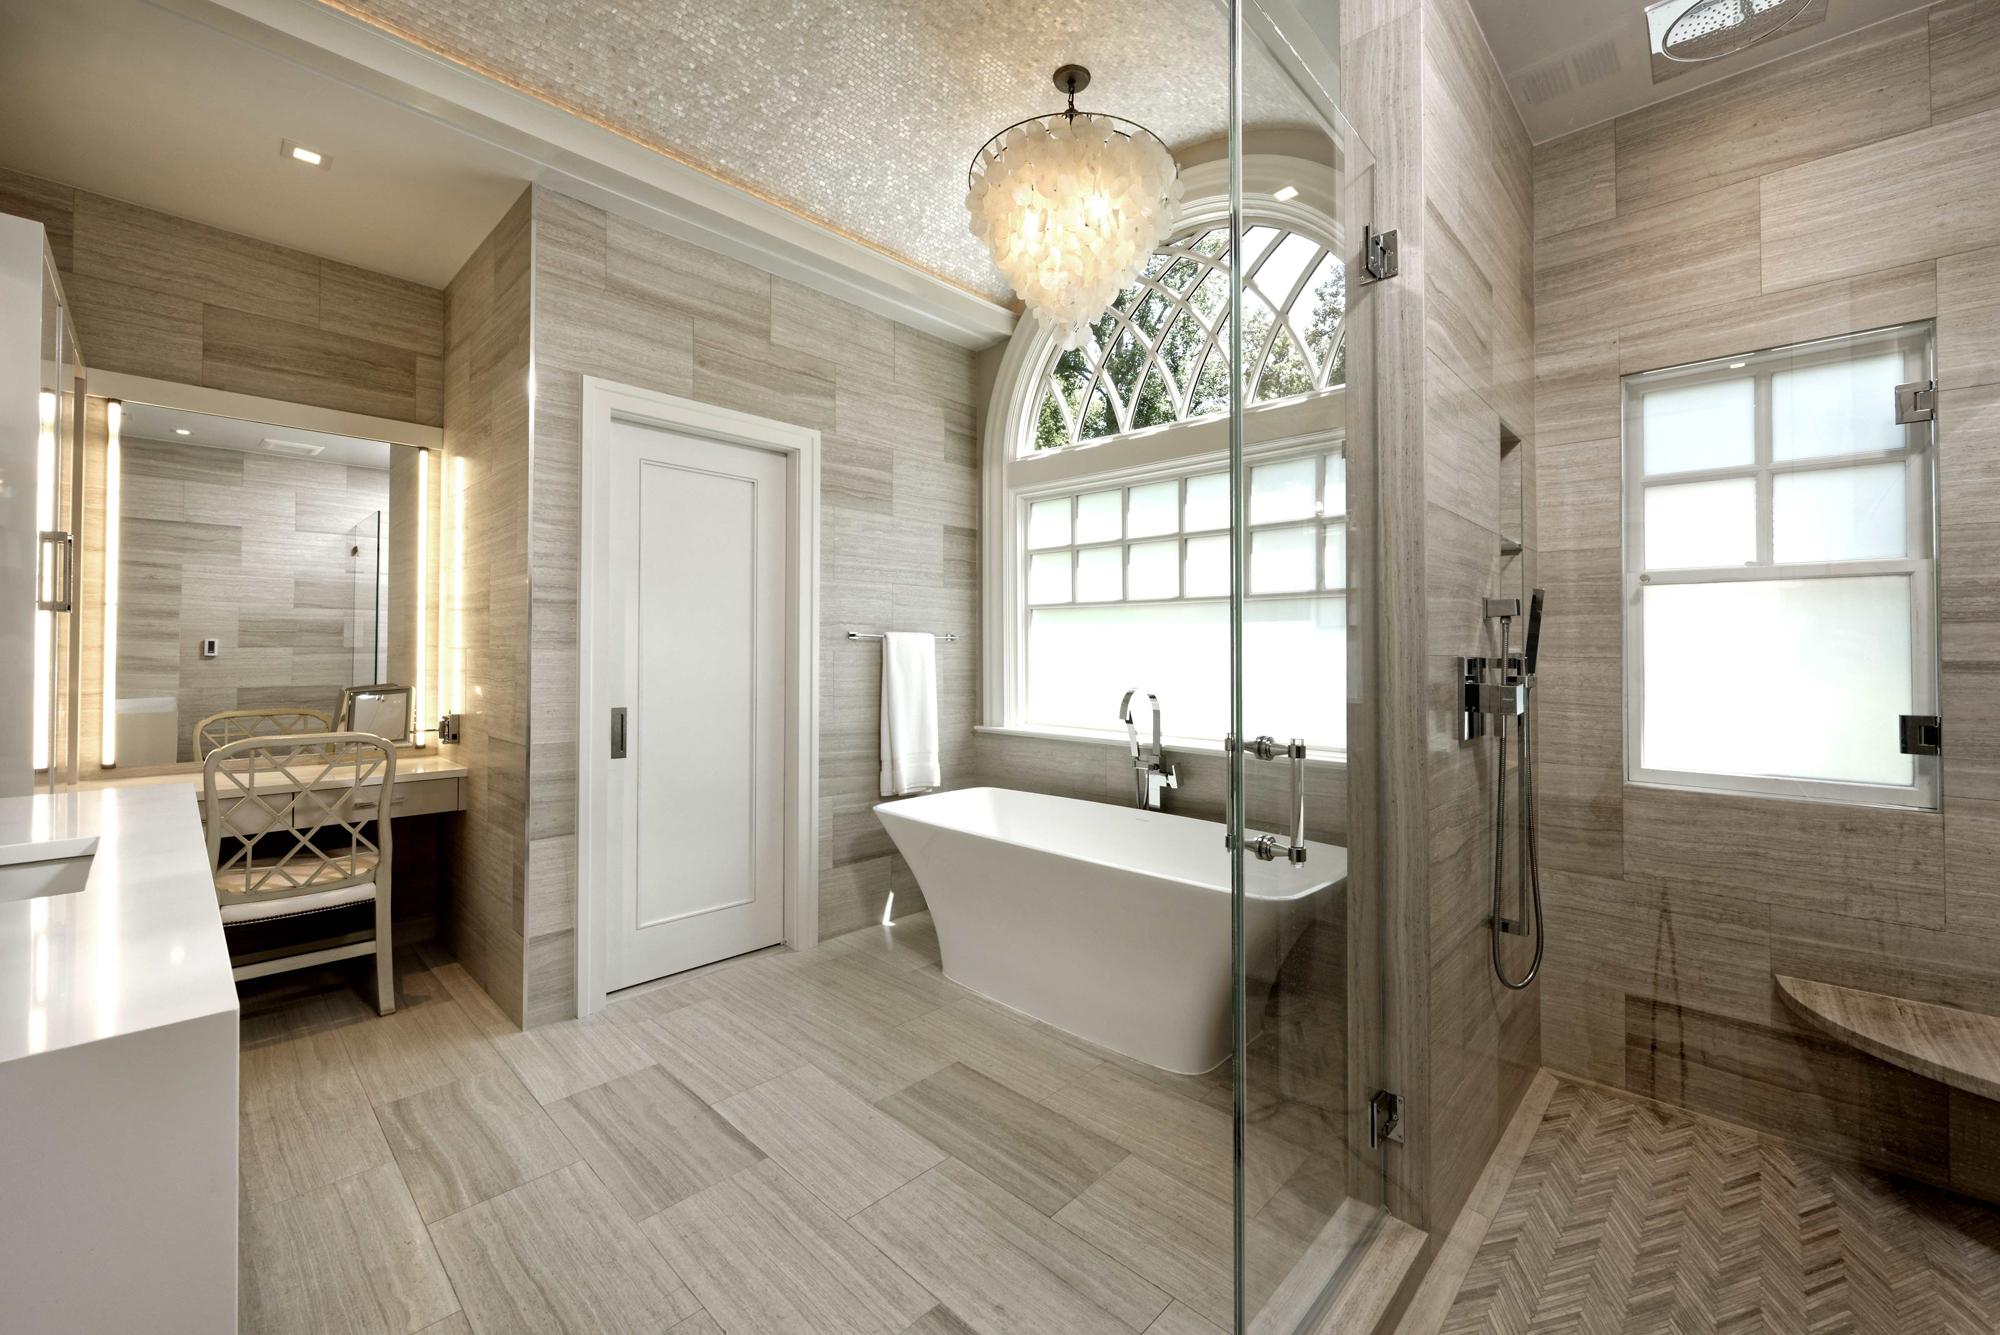 Modern Luxury Kitchen, Master Bath and Basement Remodel in ...